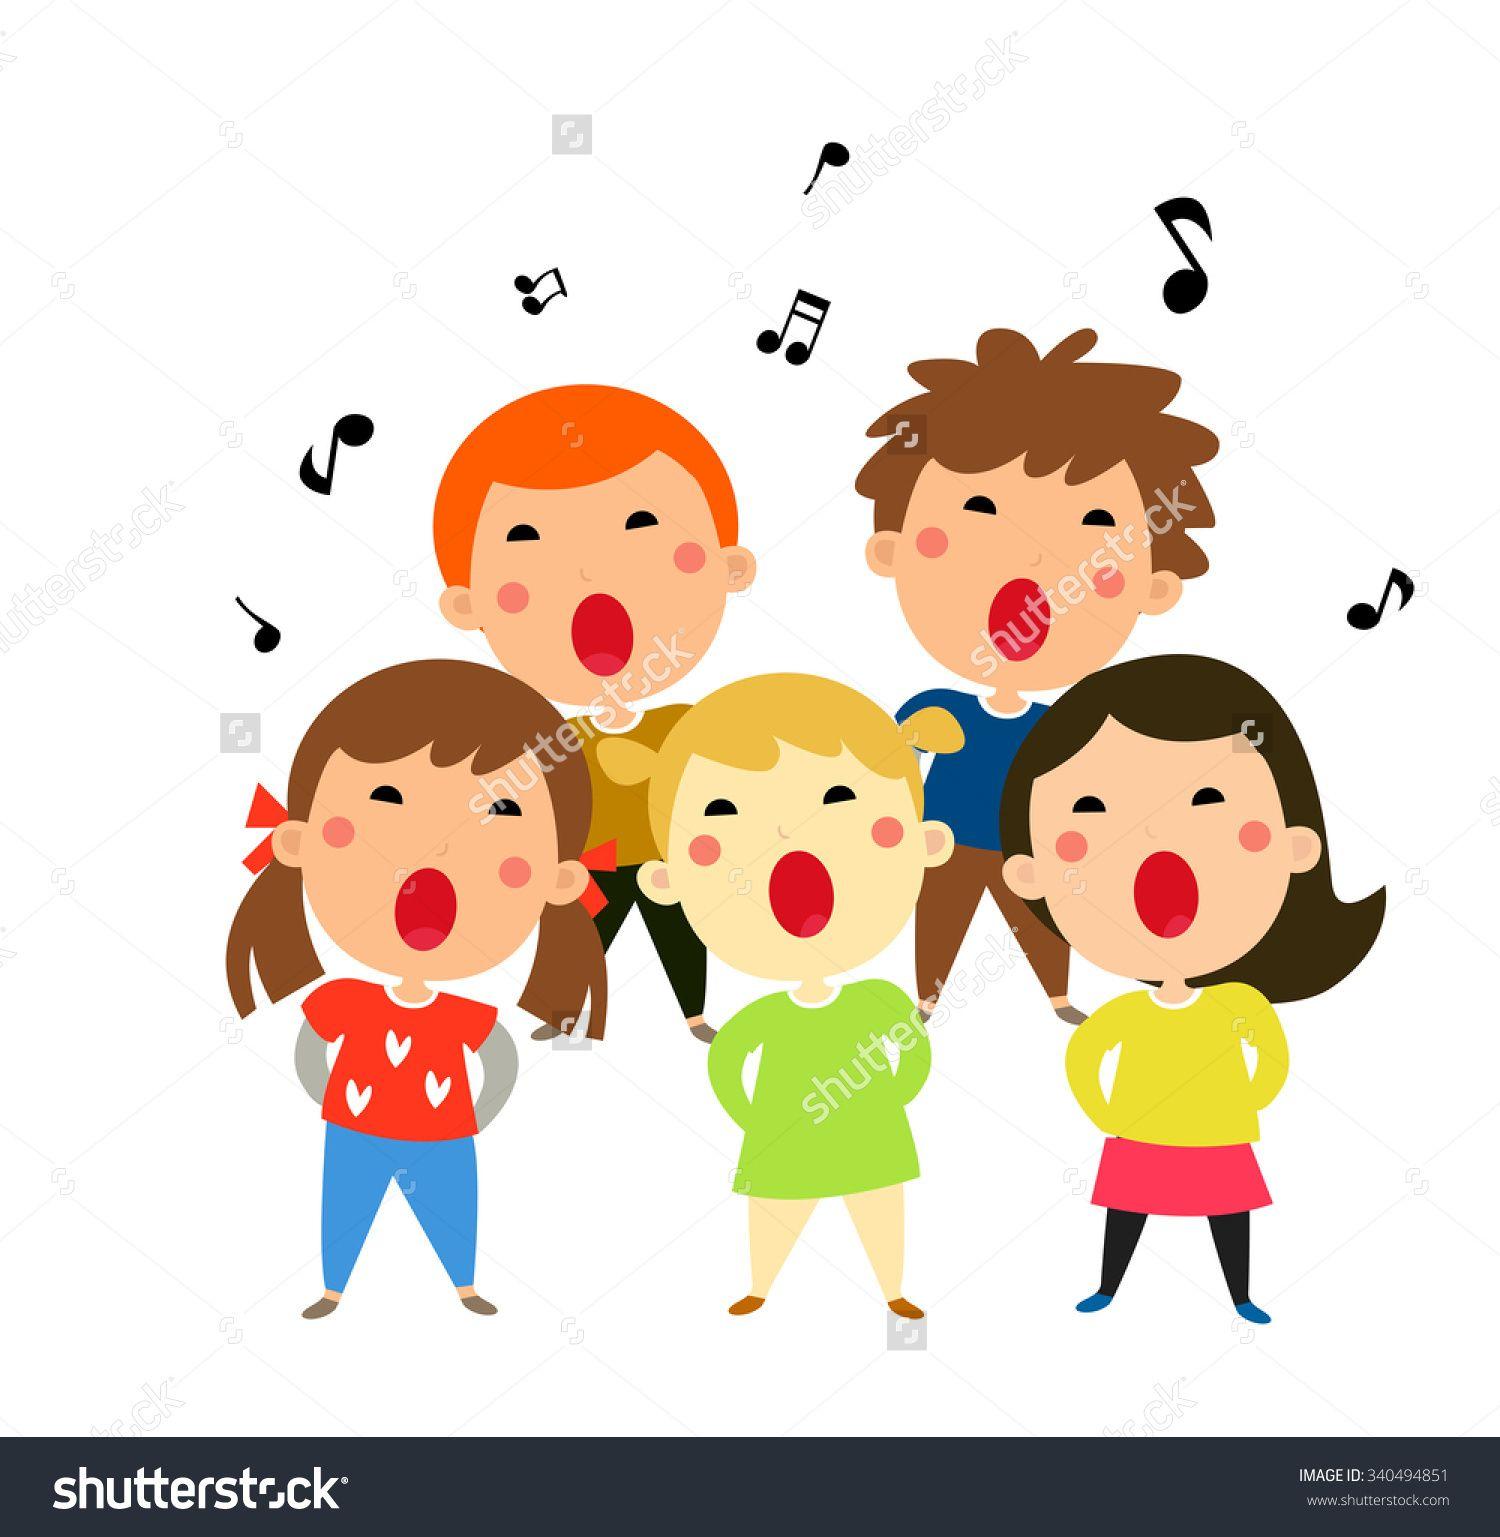 Clipart children sing together